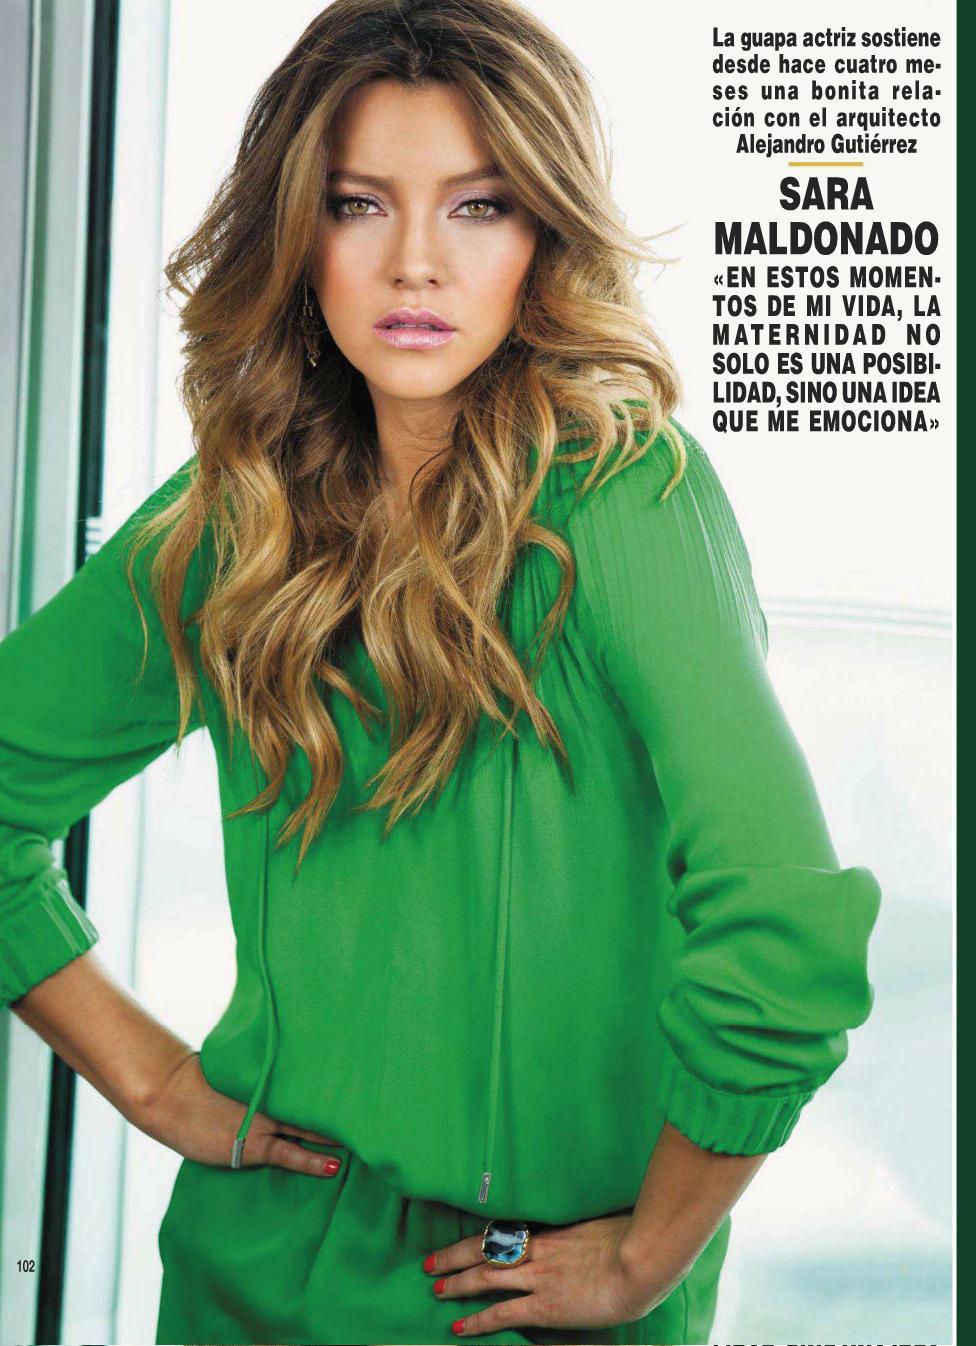 Sara Maldonado/სარა მალდონადო - Page 6 82c8005f9bb0a011b9d264404335b5ce